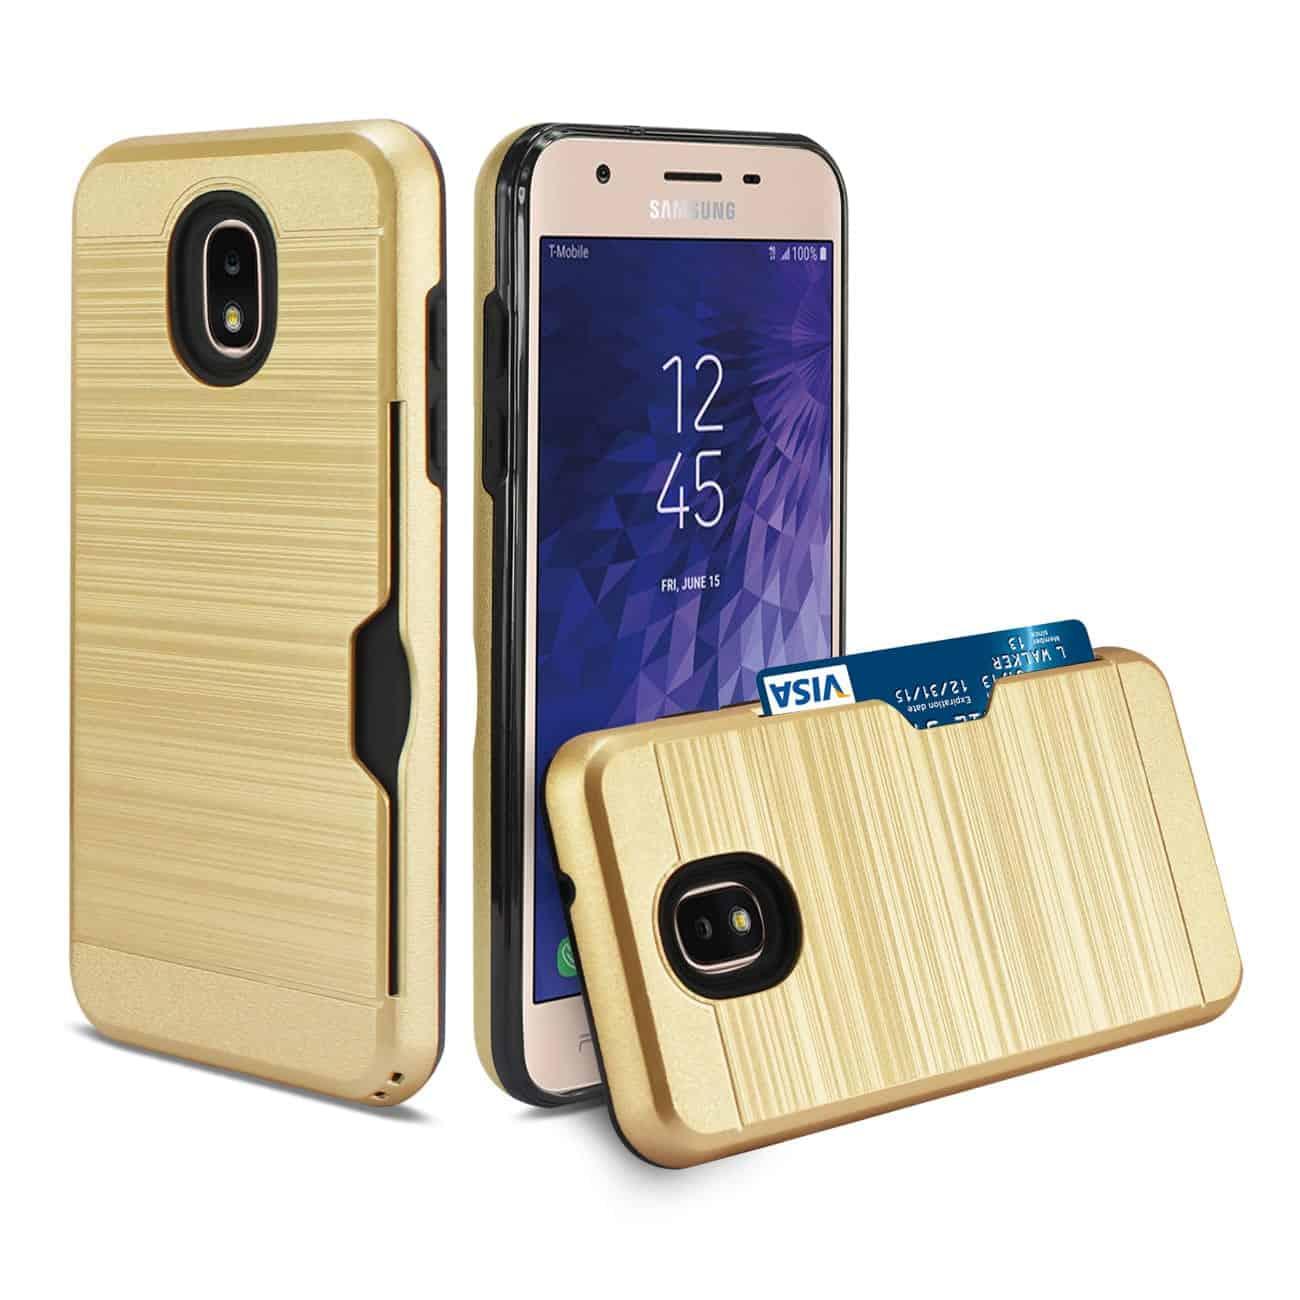 Samsung J3(2018) Slim Armor Hybrid Case With Card Holder In Gold